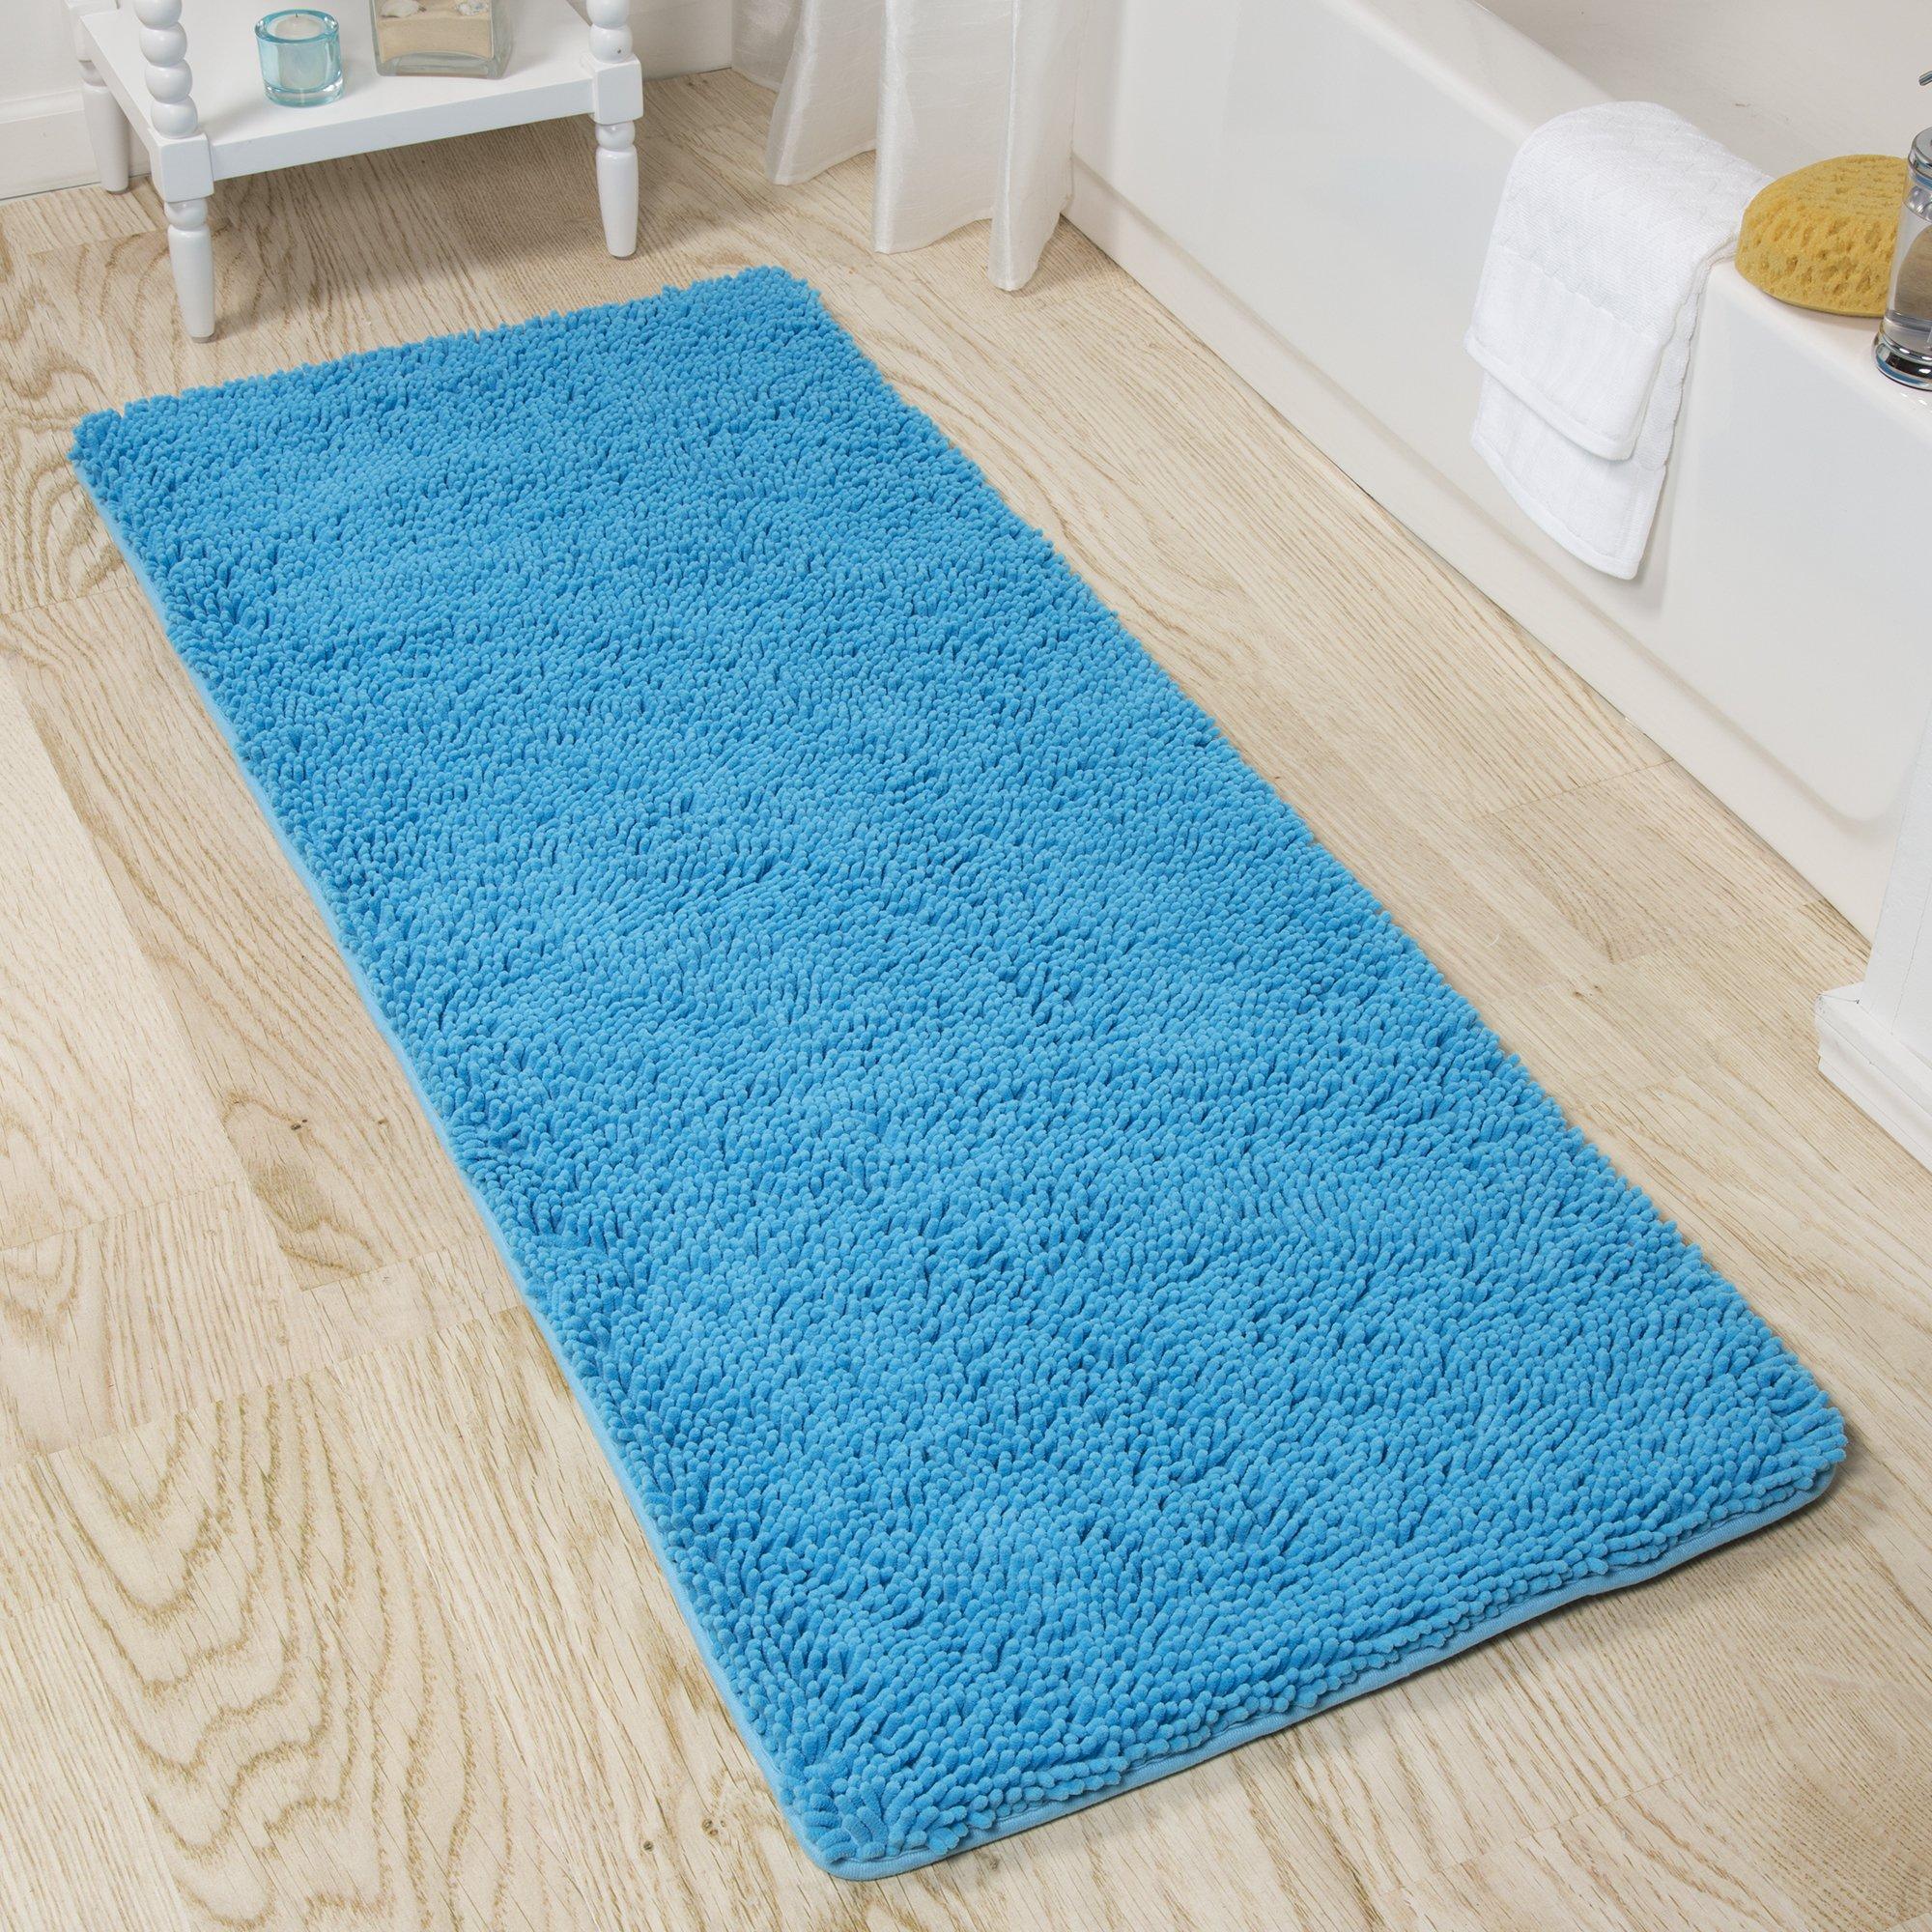 Lavish Home Memory Foam Shag Bath Mat 2-Feet by 5-Feet - Blue